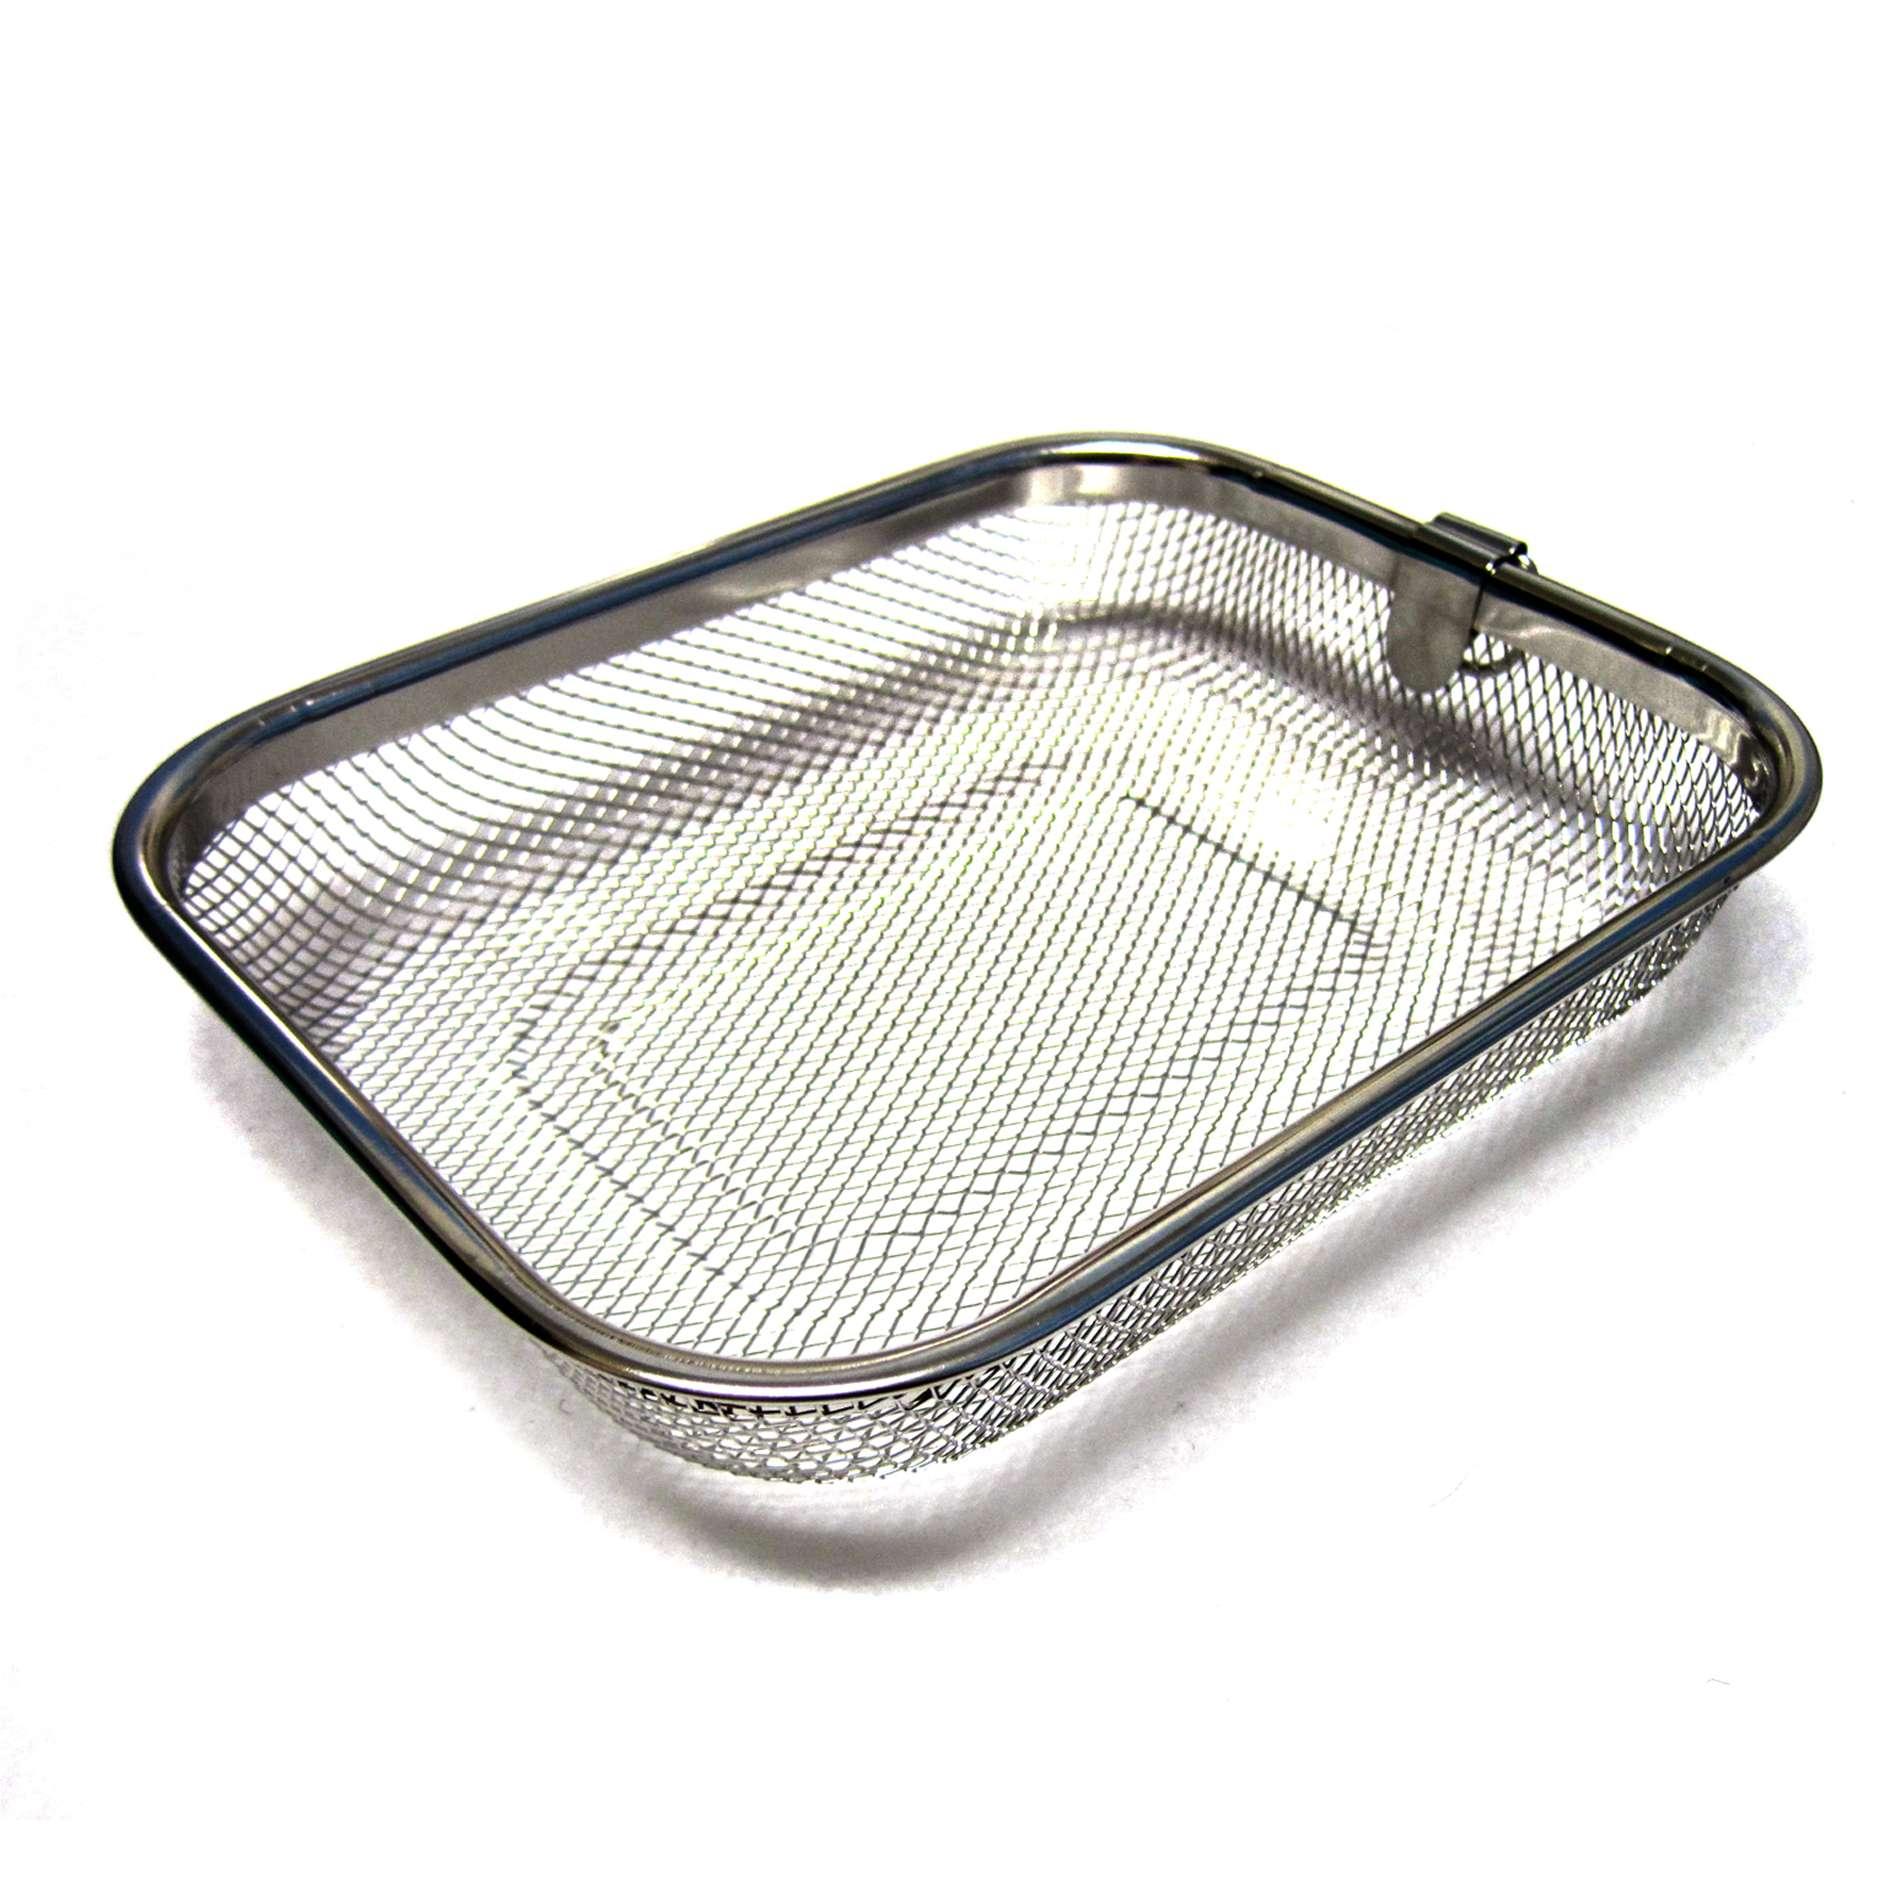 stainless sink dish drying rack veggie fruit washing tray drainer kitchen holder. Black Bedroom Furniture Sets. Home Design Ideas